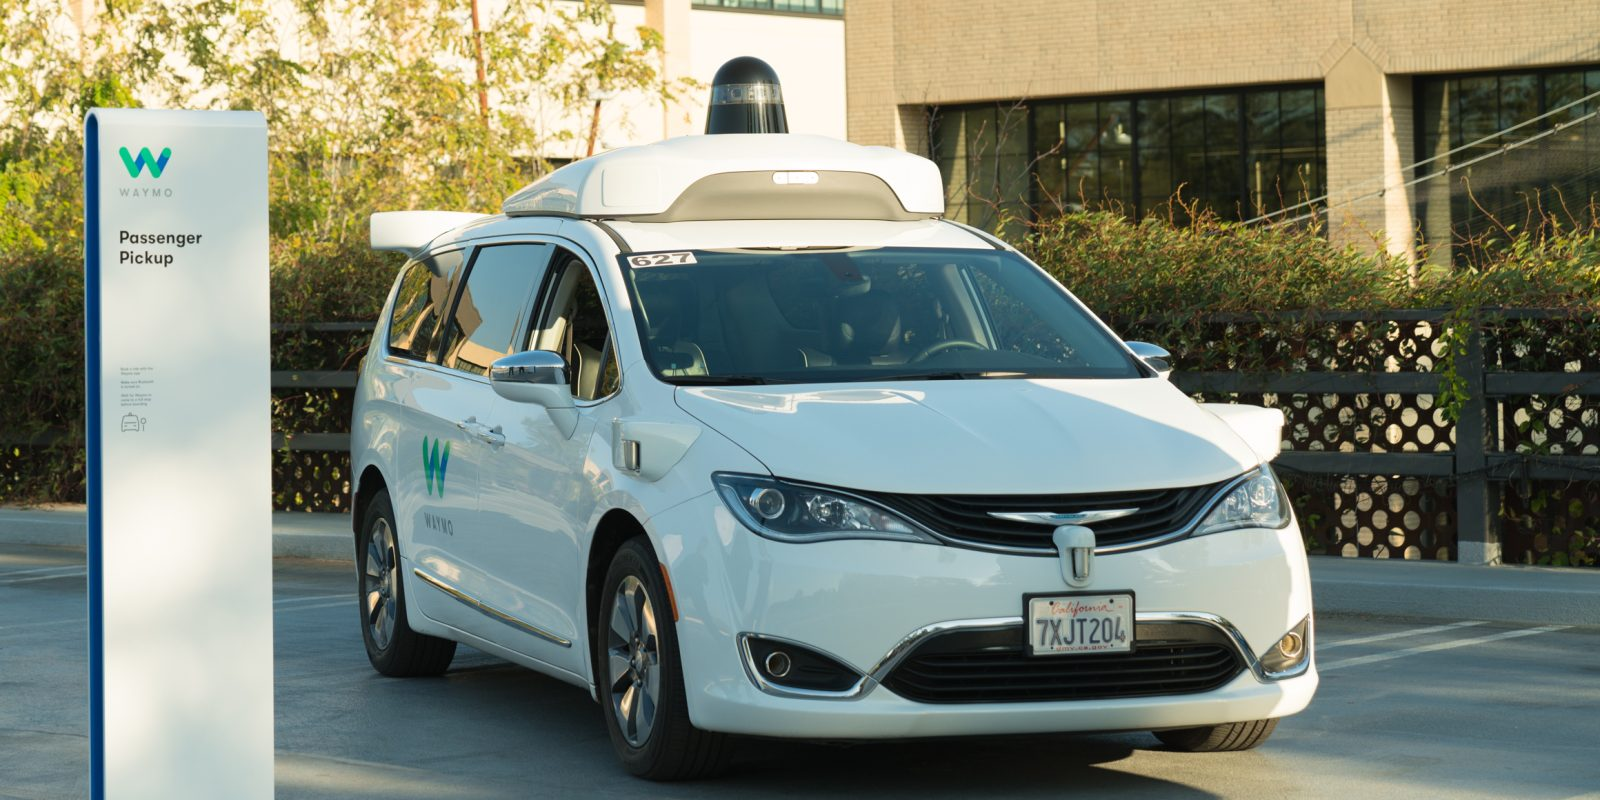 Waymo self-driving car service launching soon, competing w